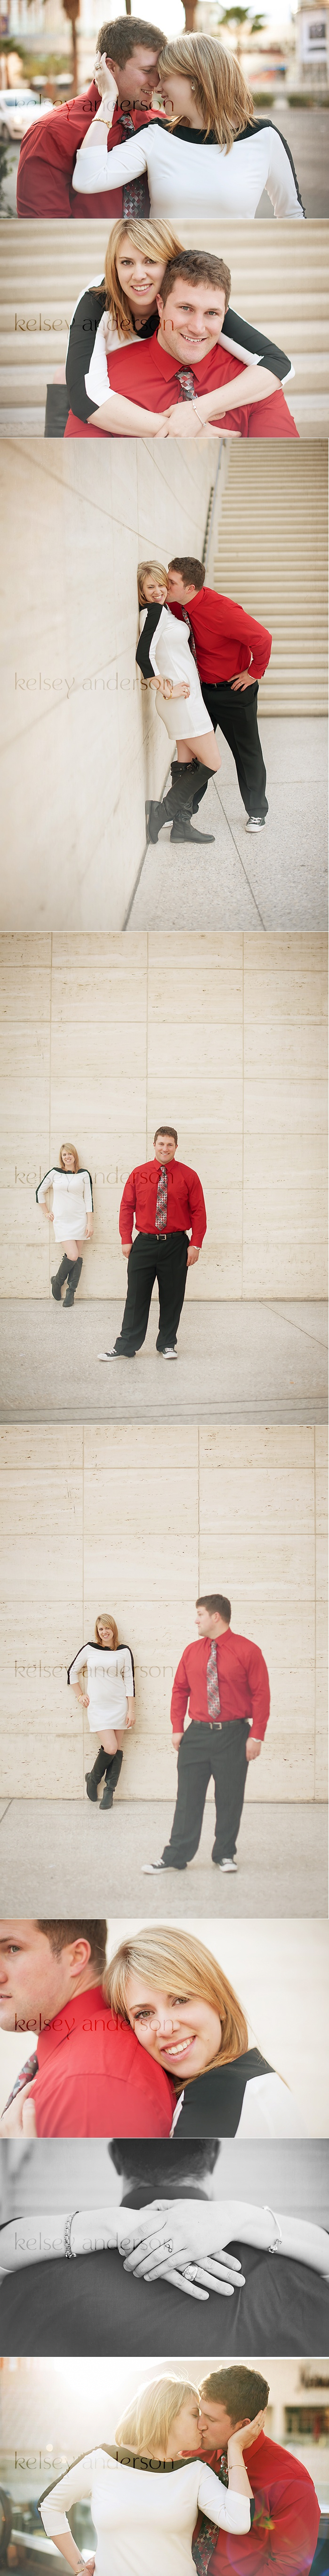 Las Vegas Couples and Engagement Photographer